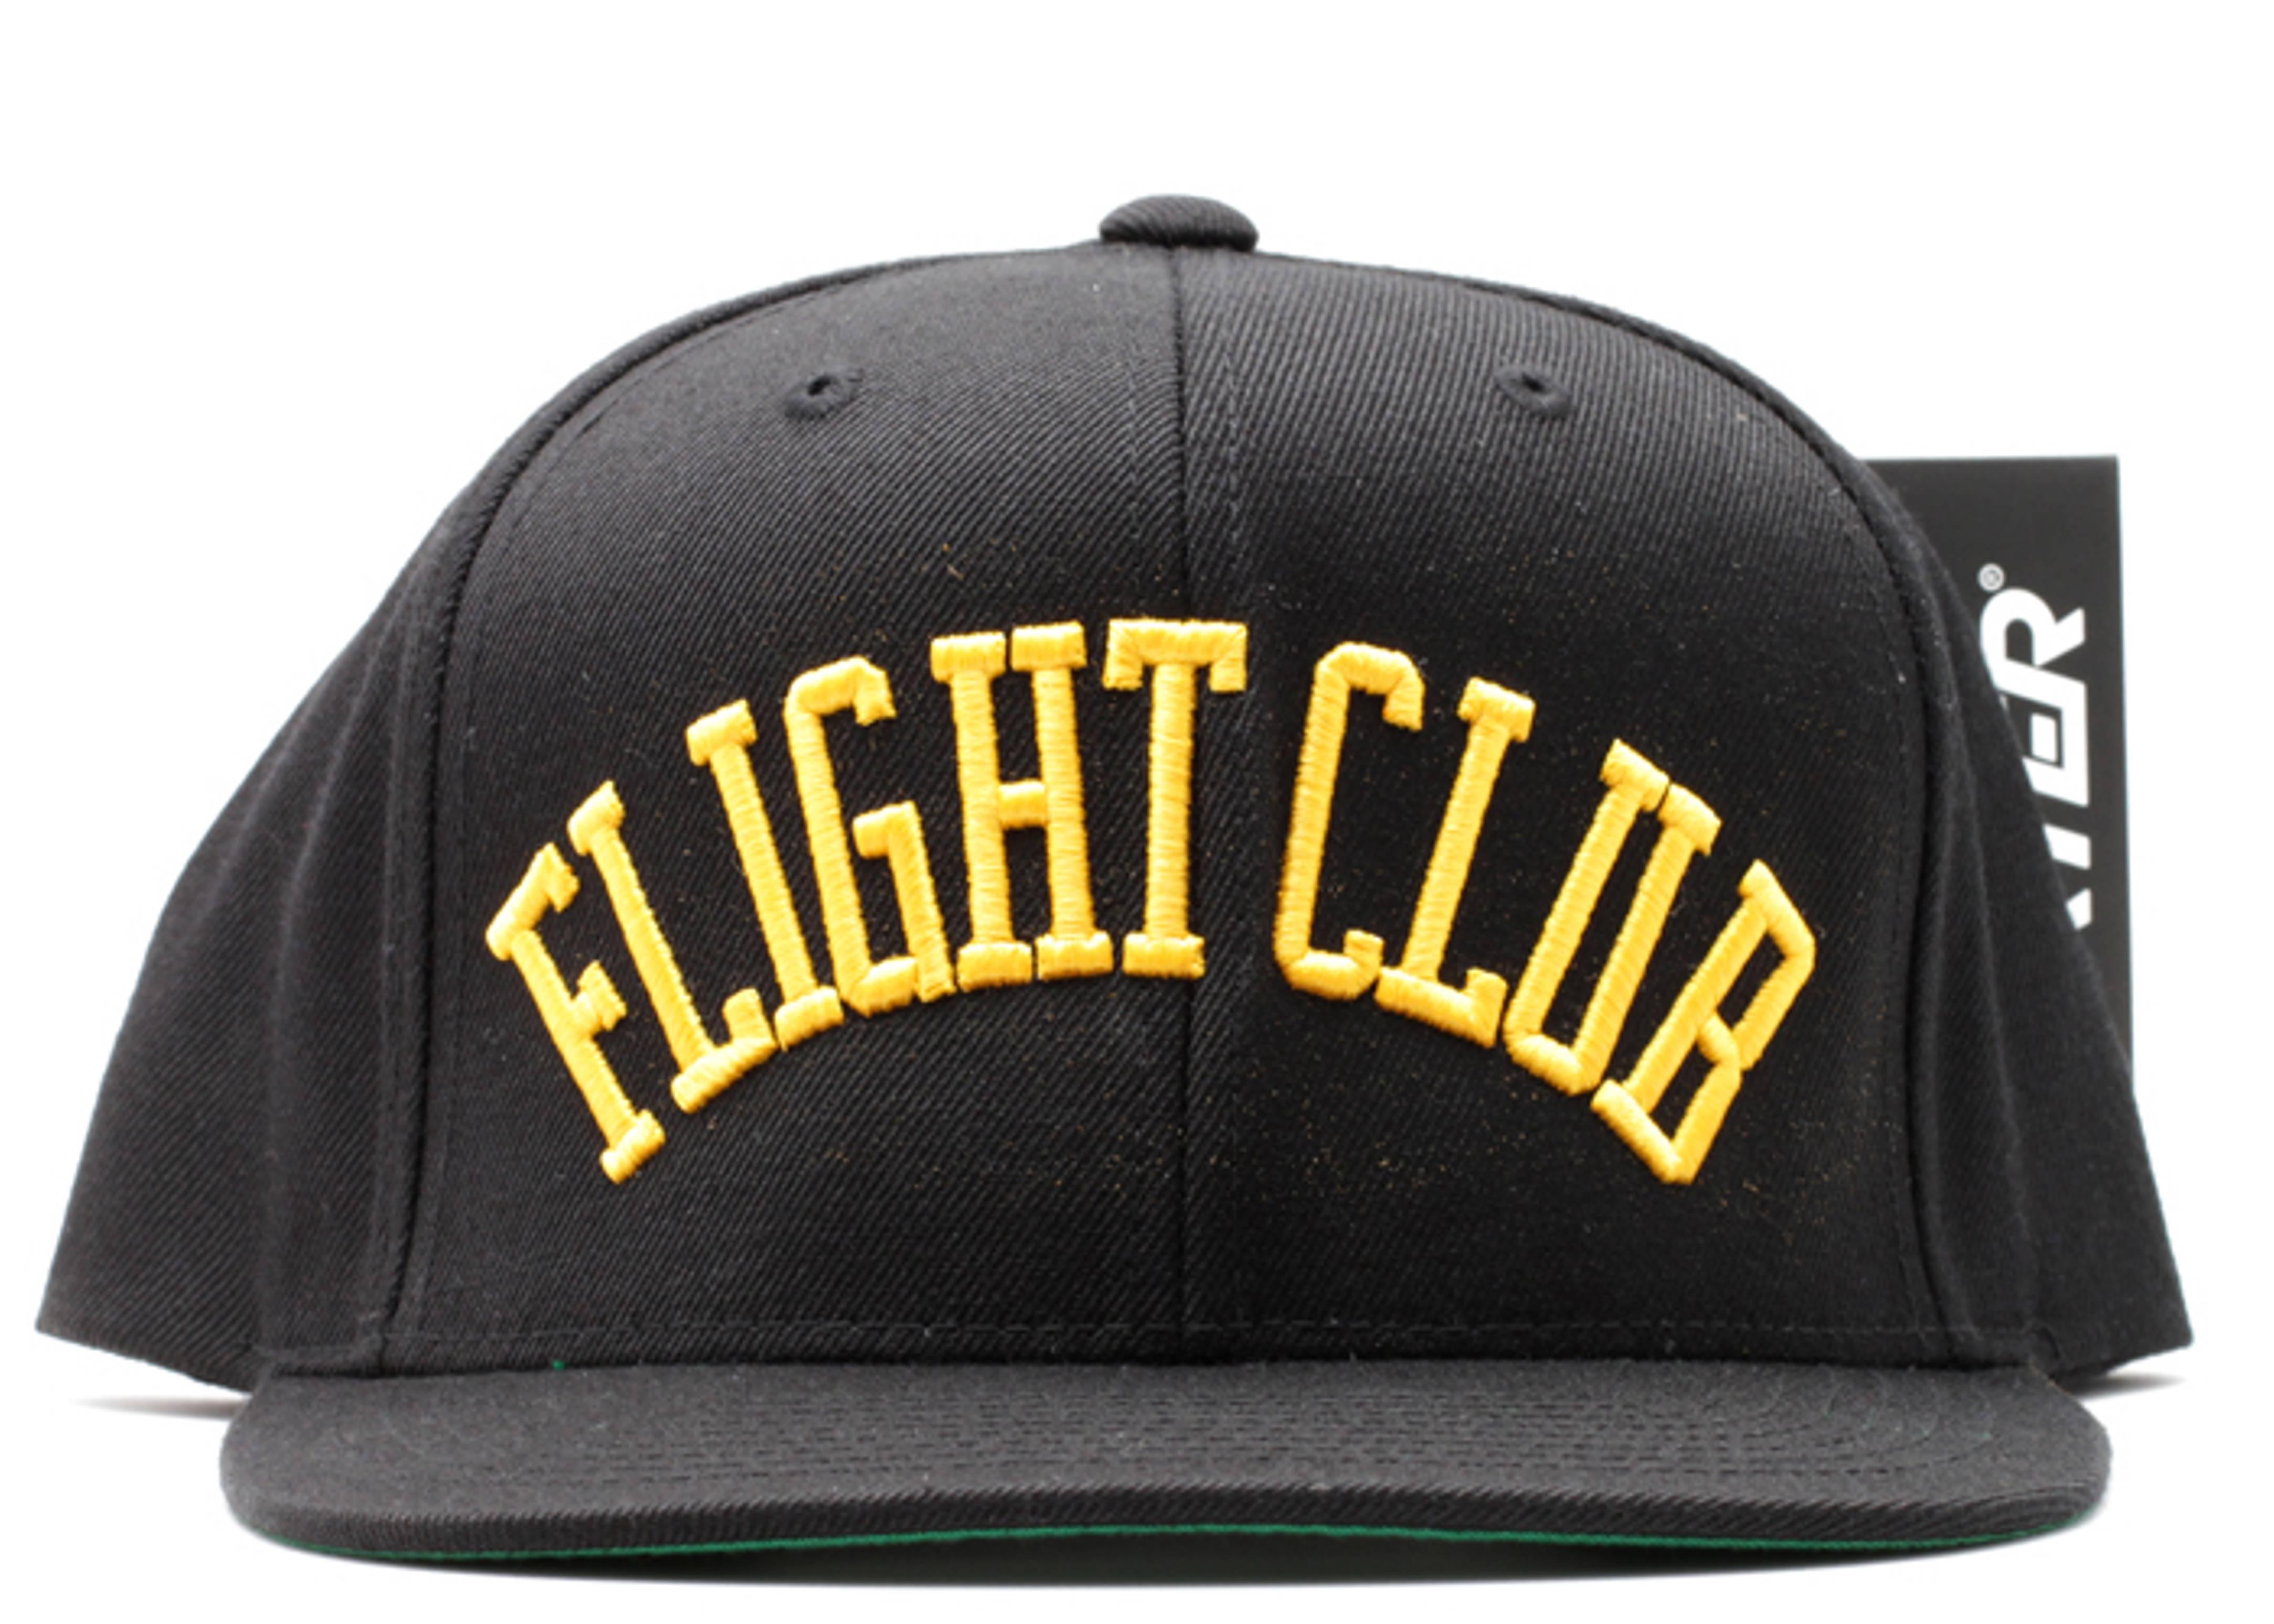 starter x flight club arch snap-back